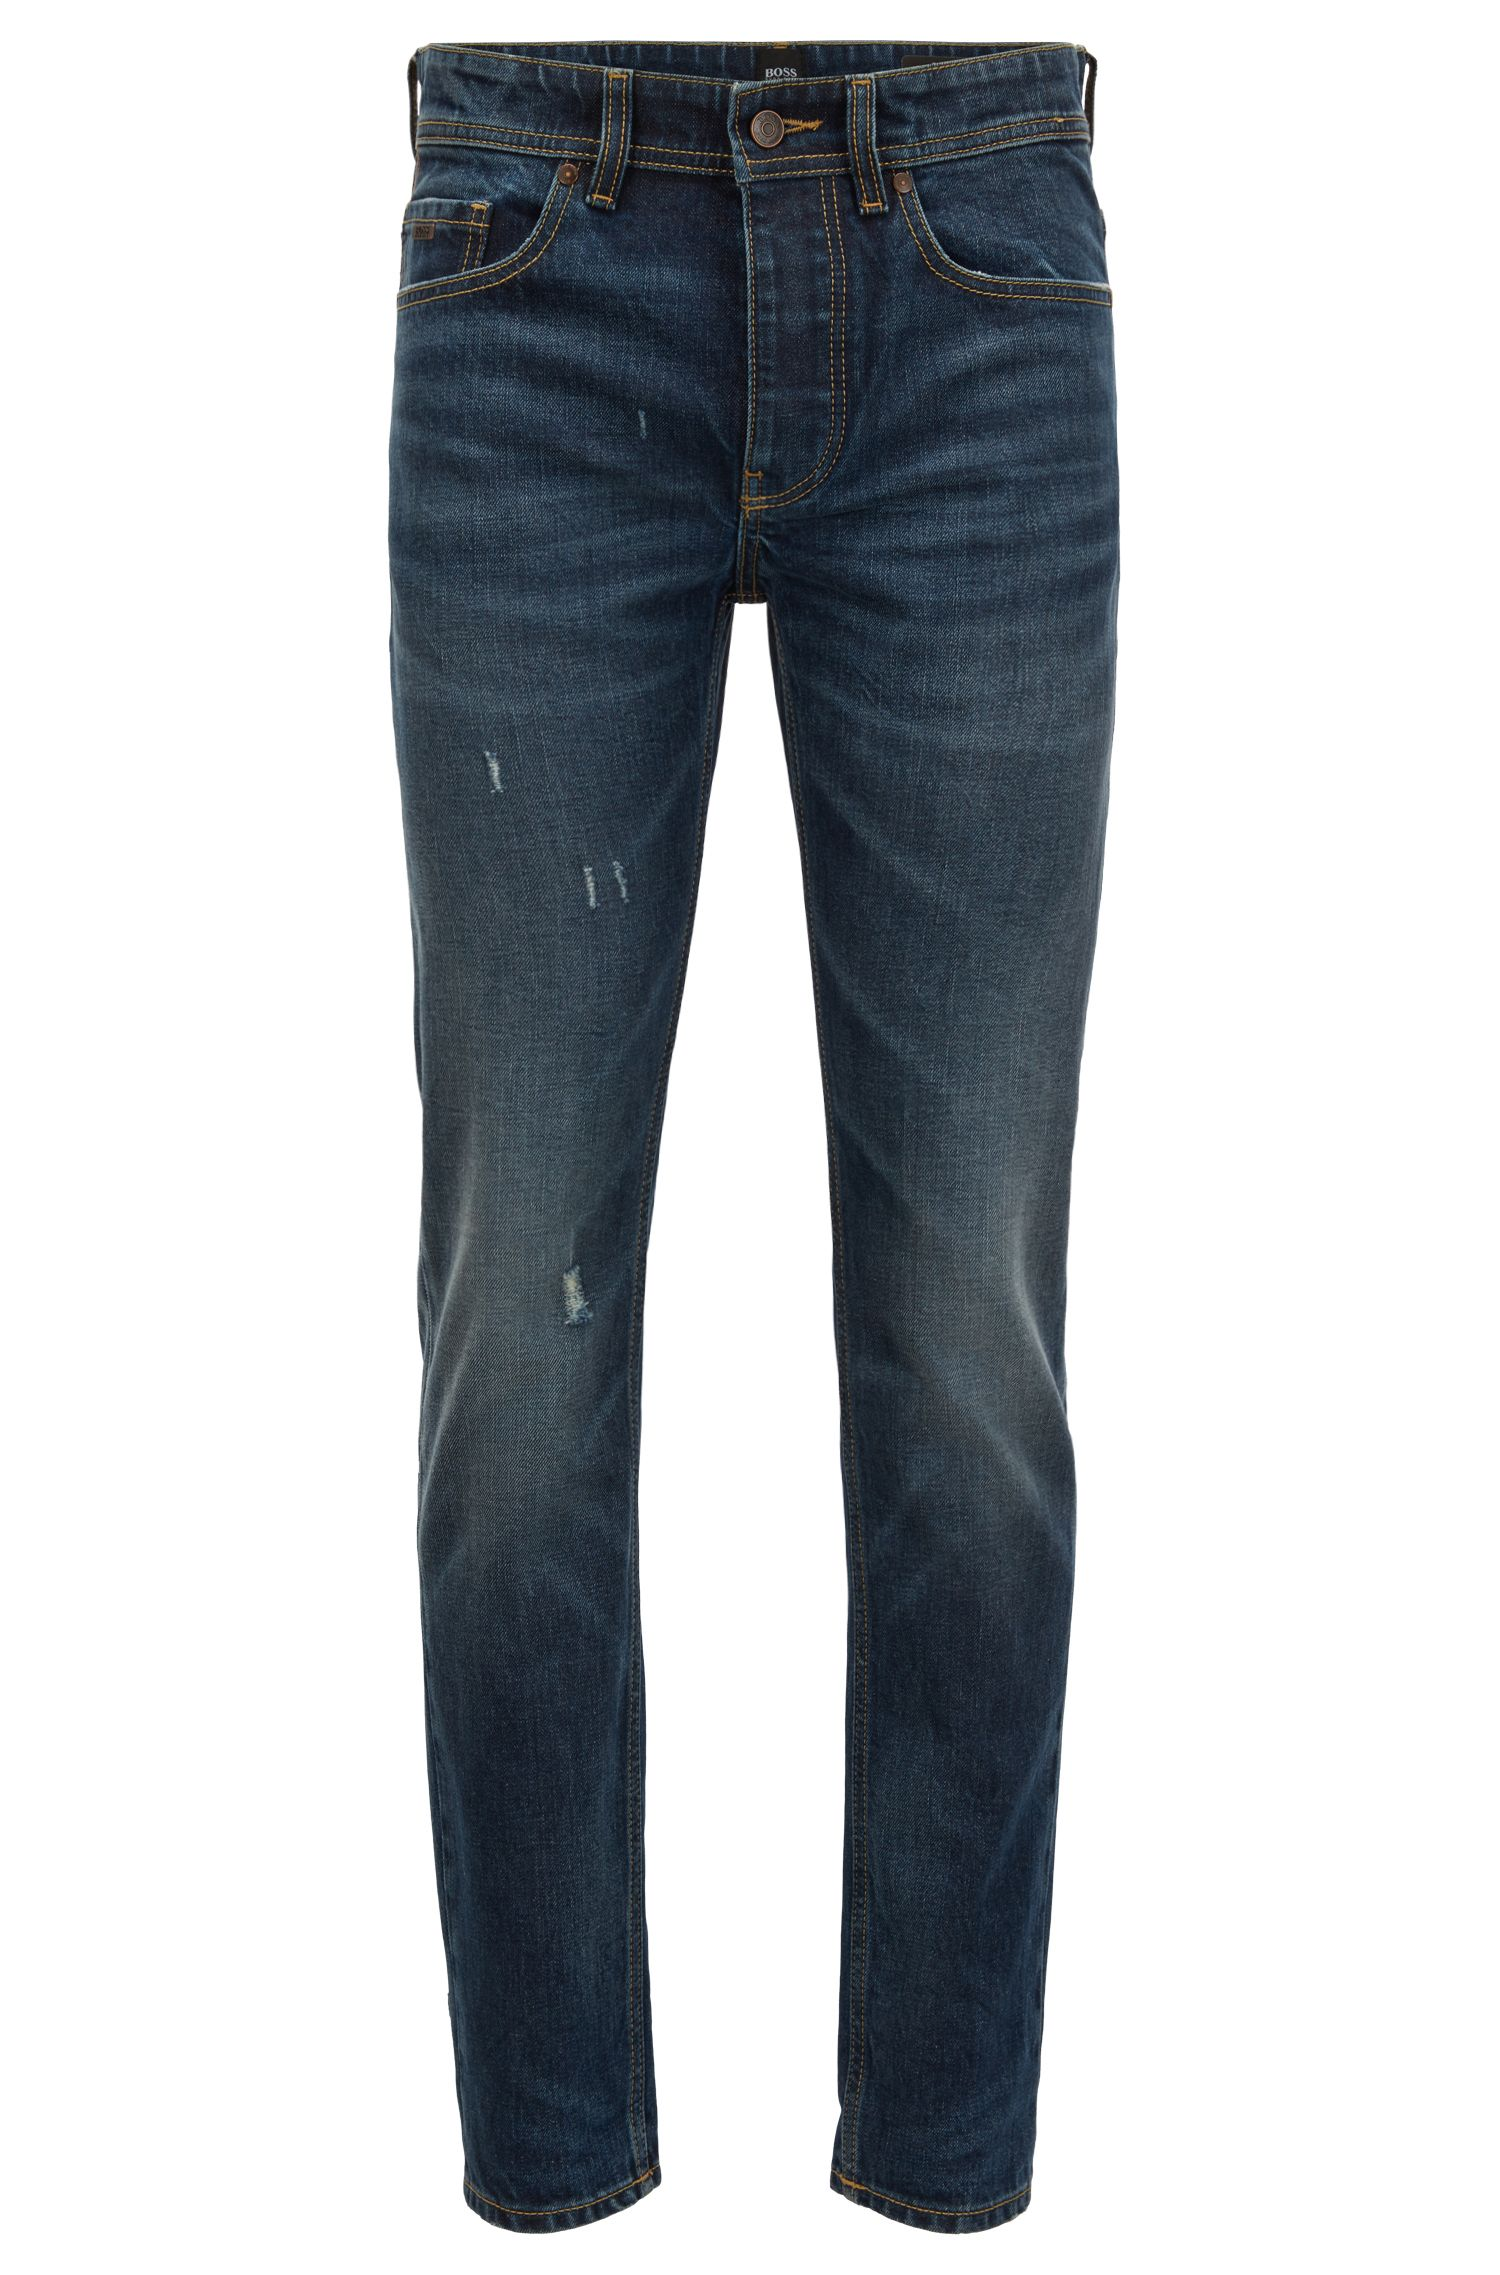 Tapered-fit jeans in comfort-stretch slub denim, Blue